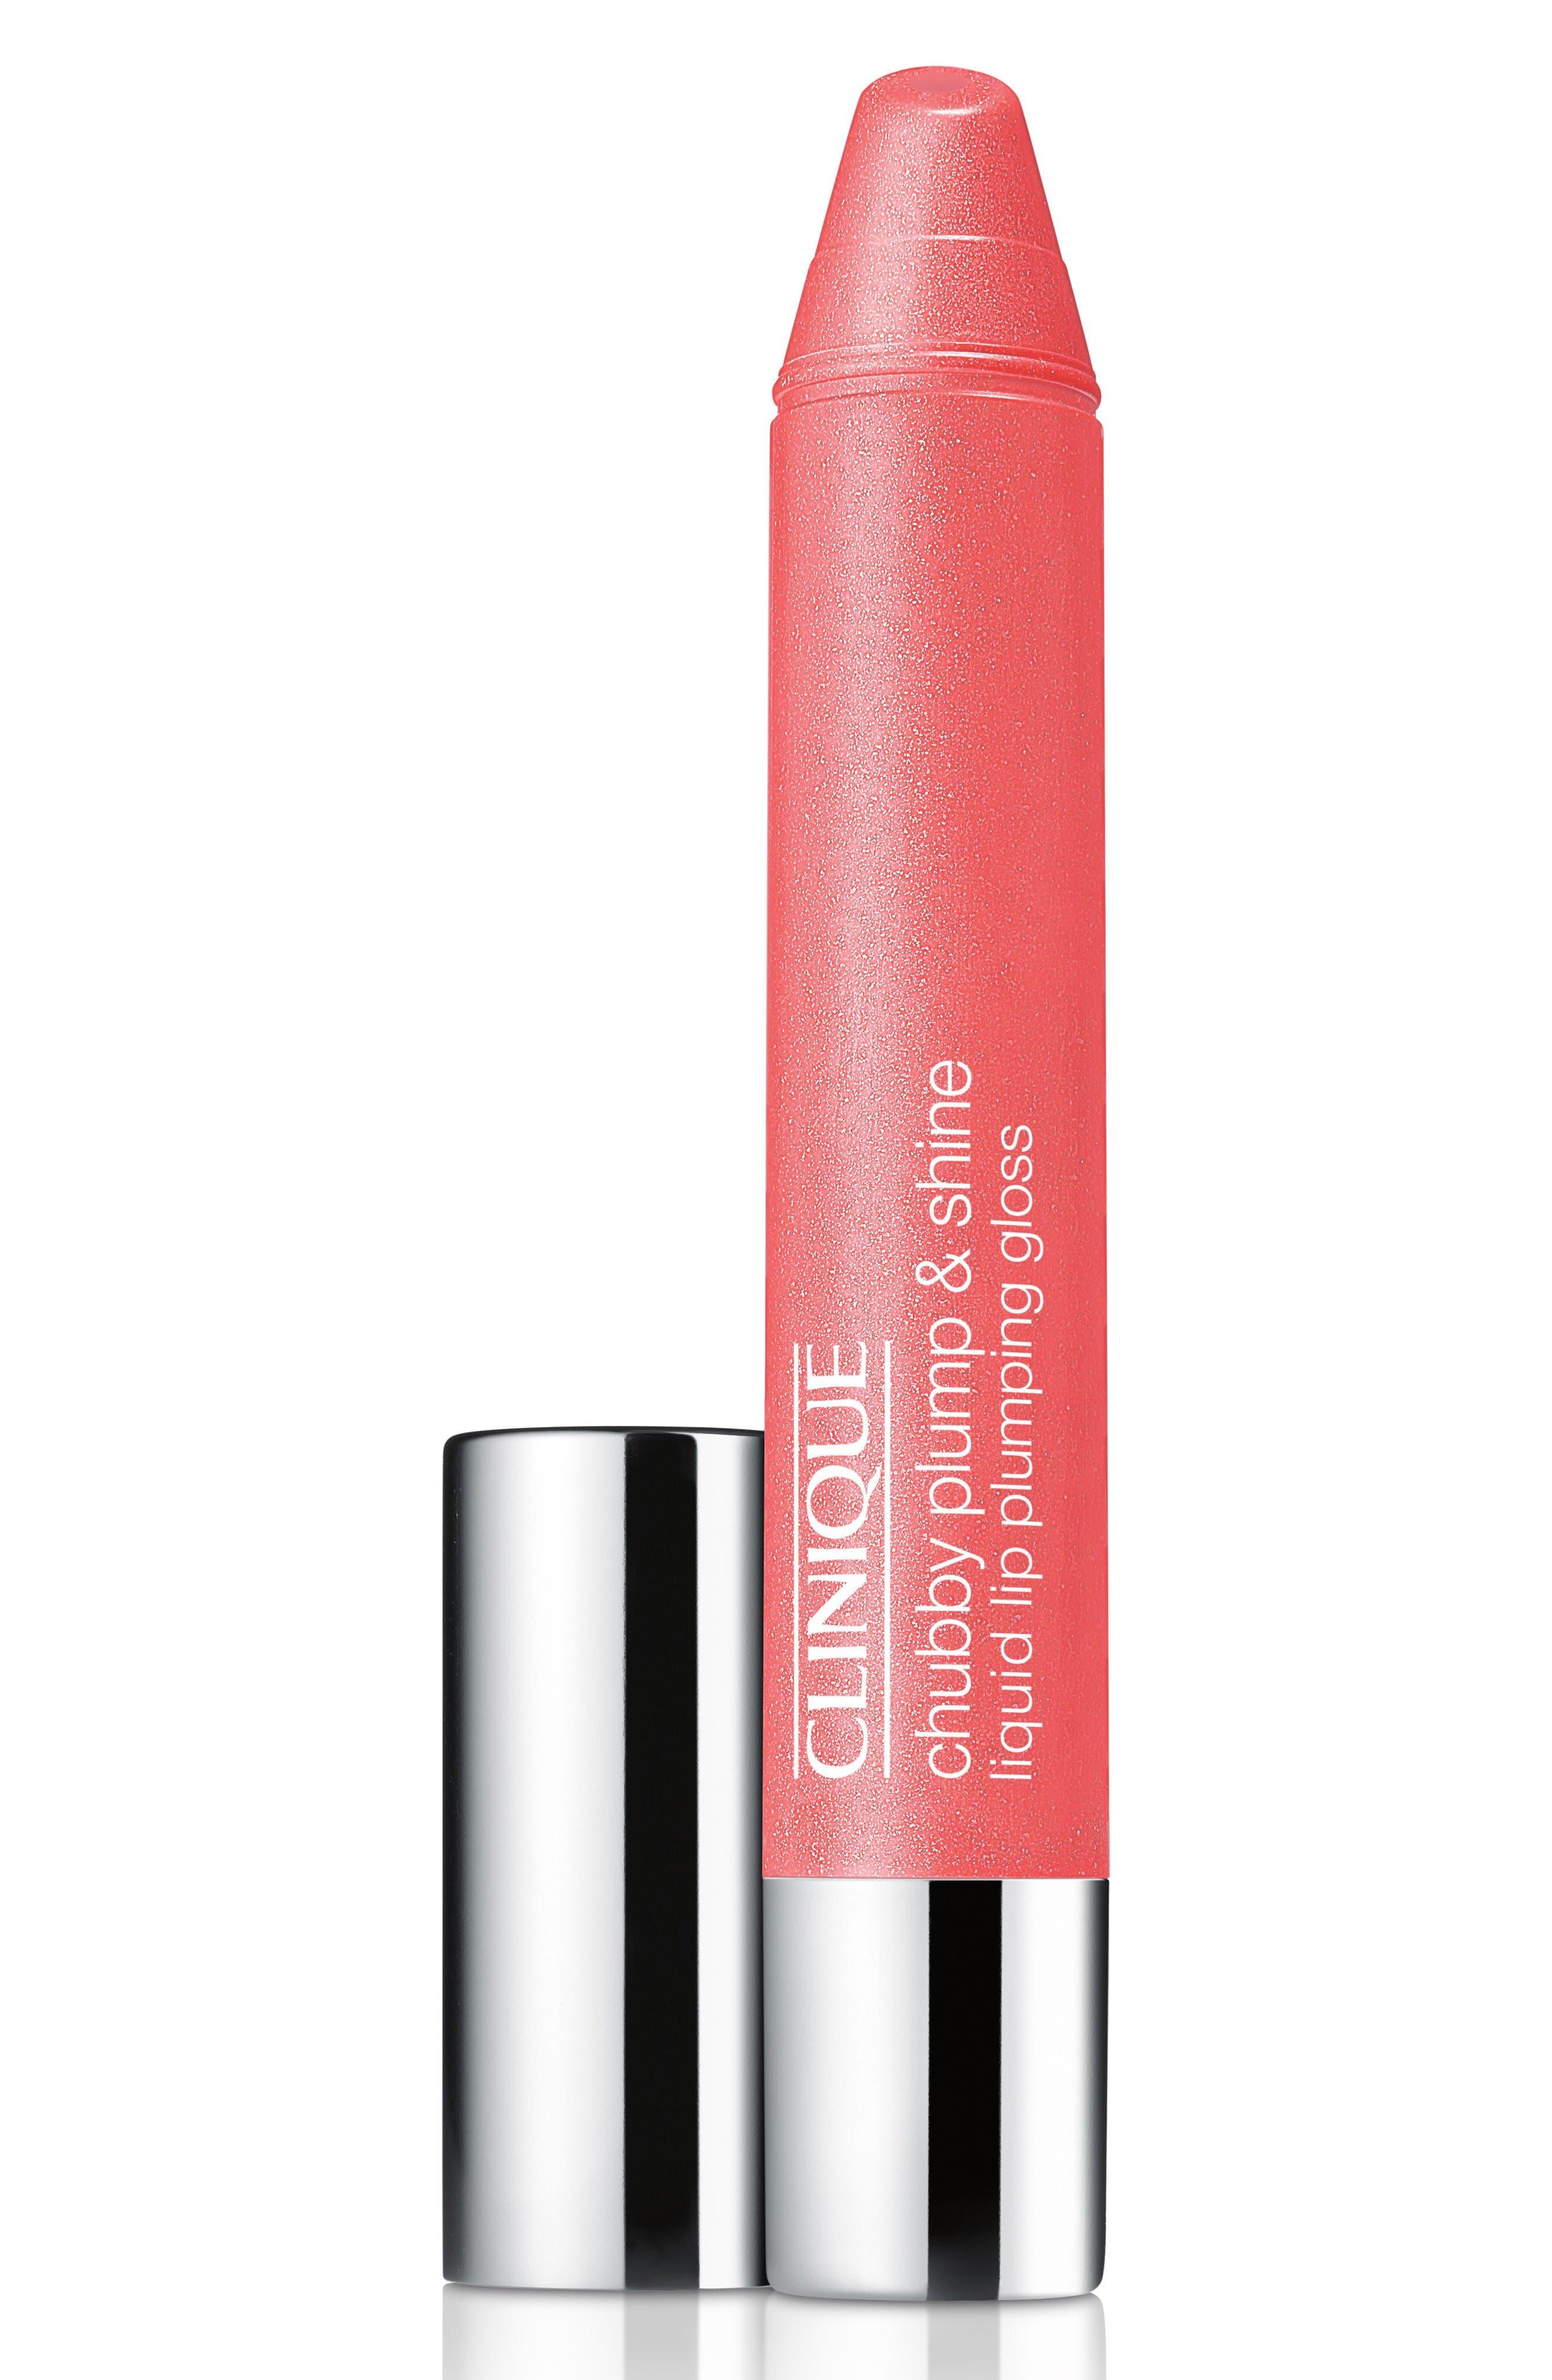 Main Image - Clinique Chubby Plump & Shine Liquid Lip Plumping Gloss